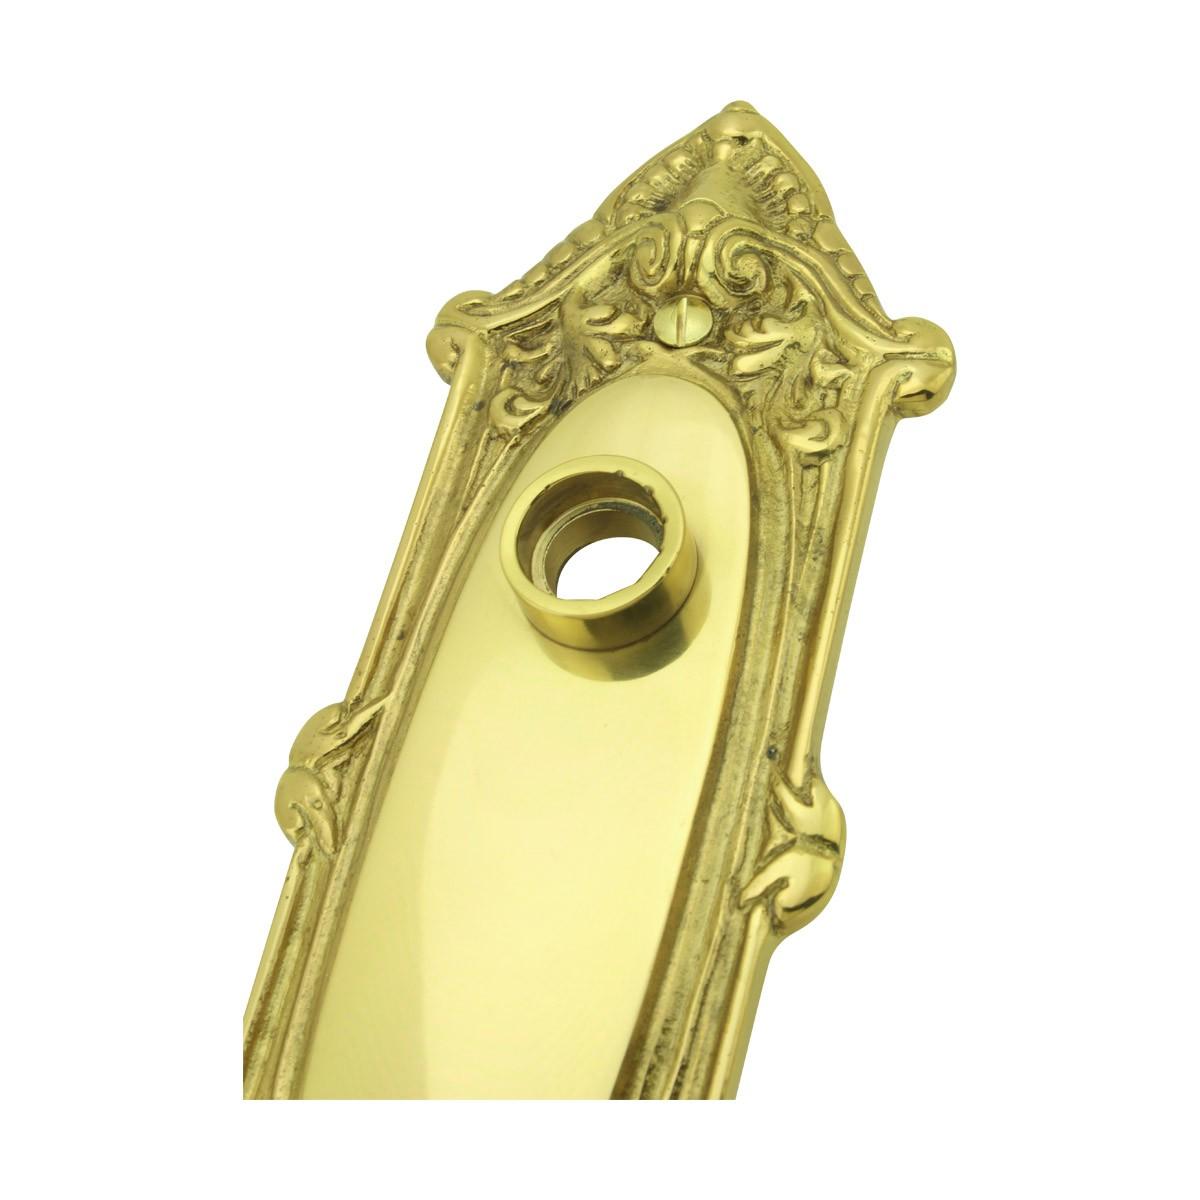 Solid Brass Doorplate, No Keyhole, 7.75in H x 2.625in W Ornate Brass Door Plates Passage Set Ornate Antique Vintage Interior Fleur De Lis 58 Collar Doorknob Doorplate